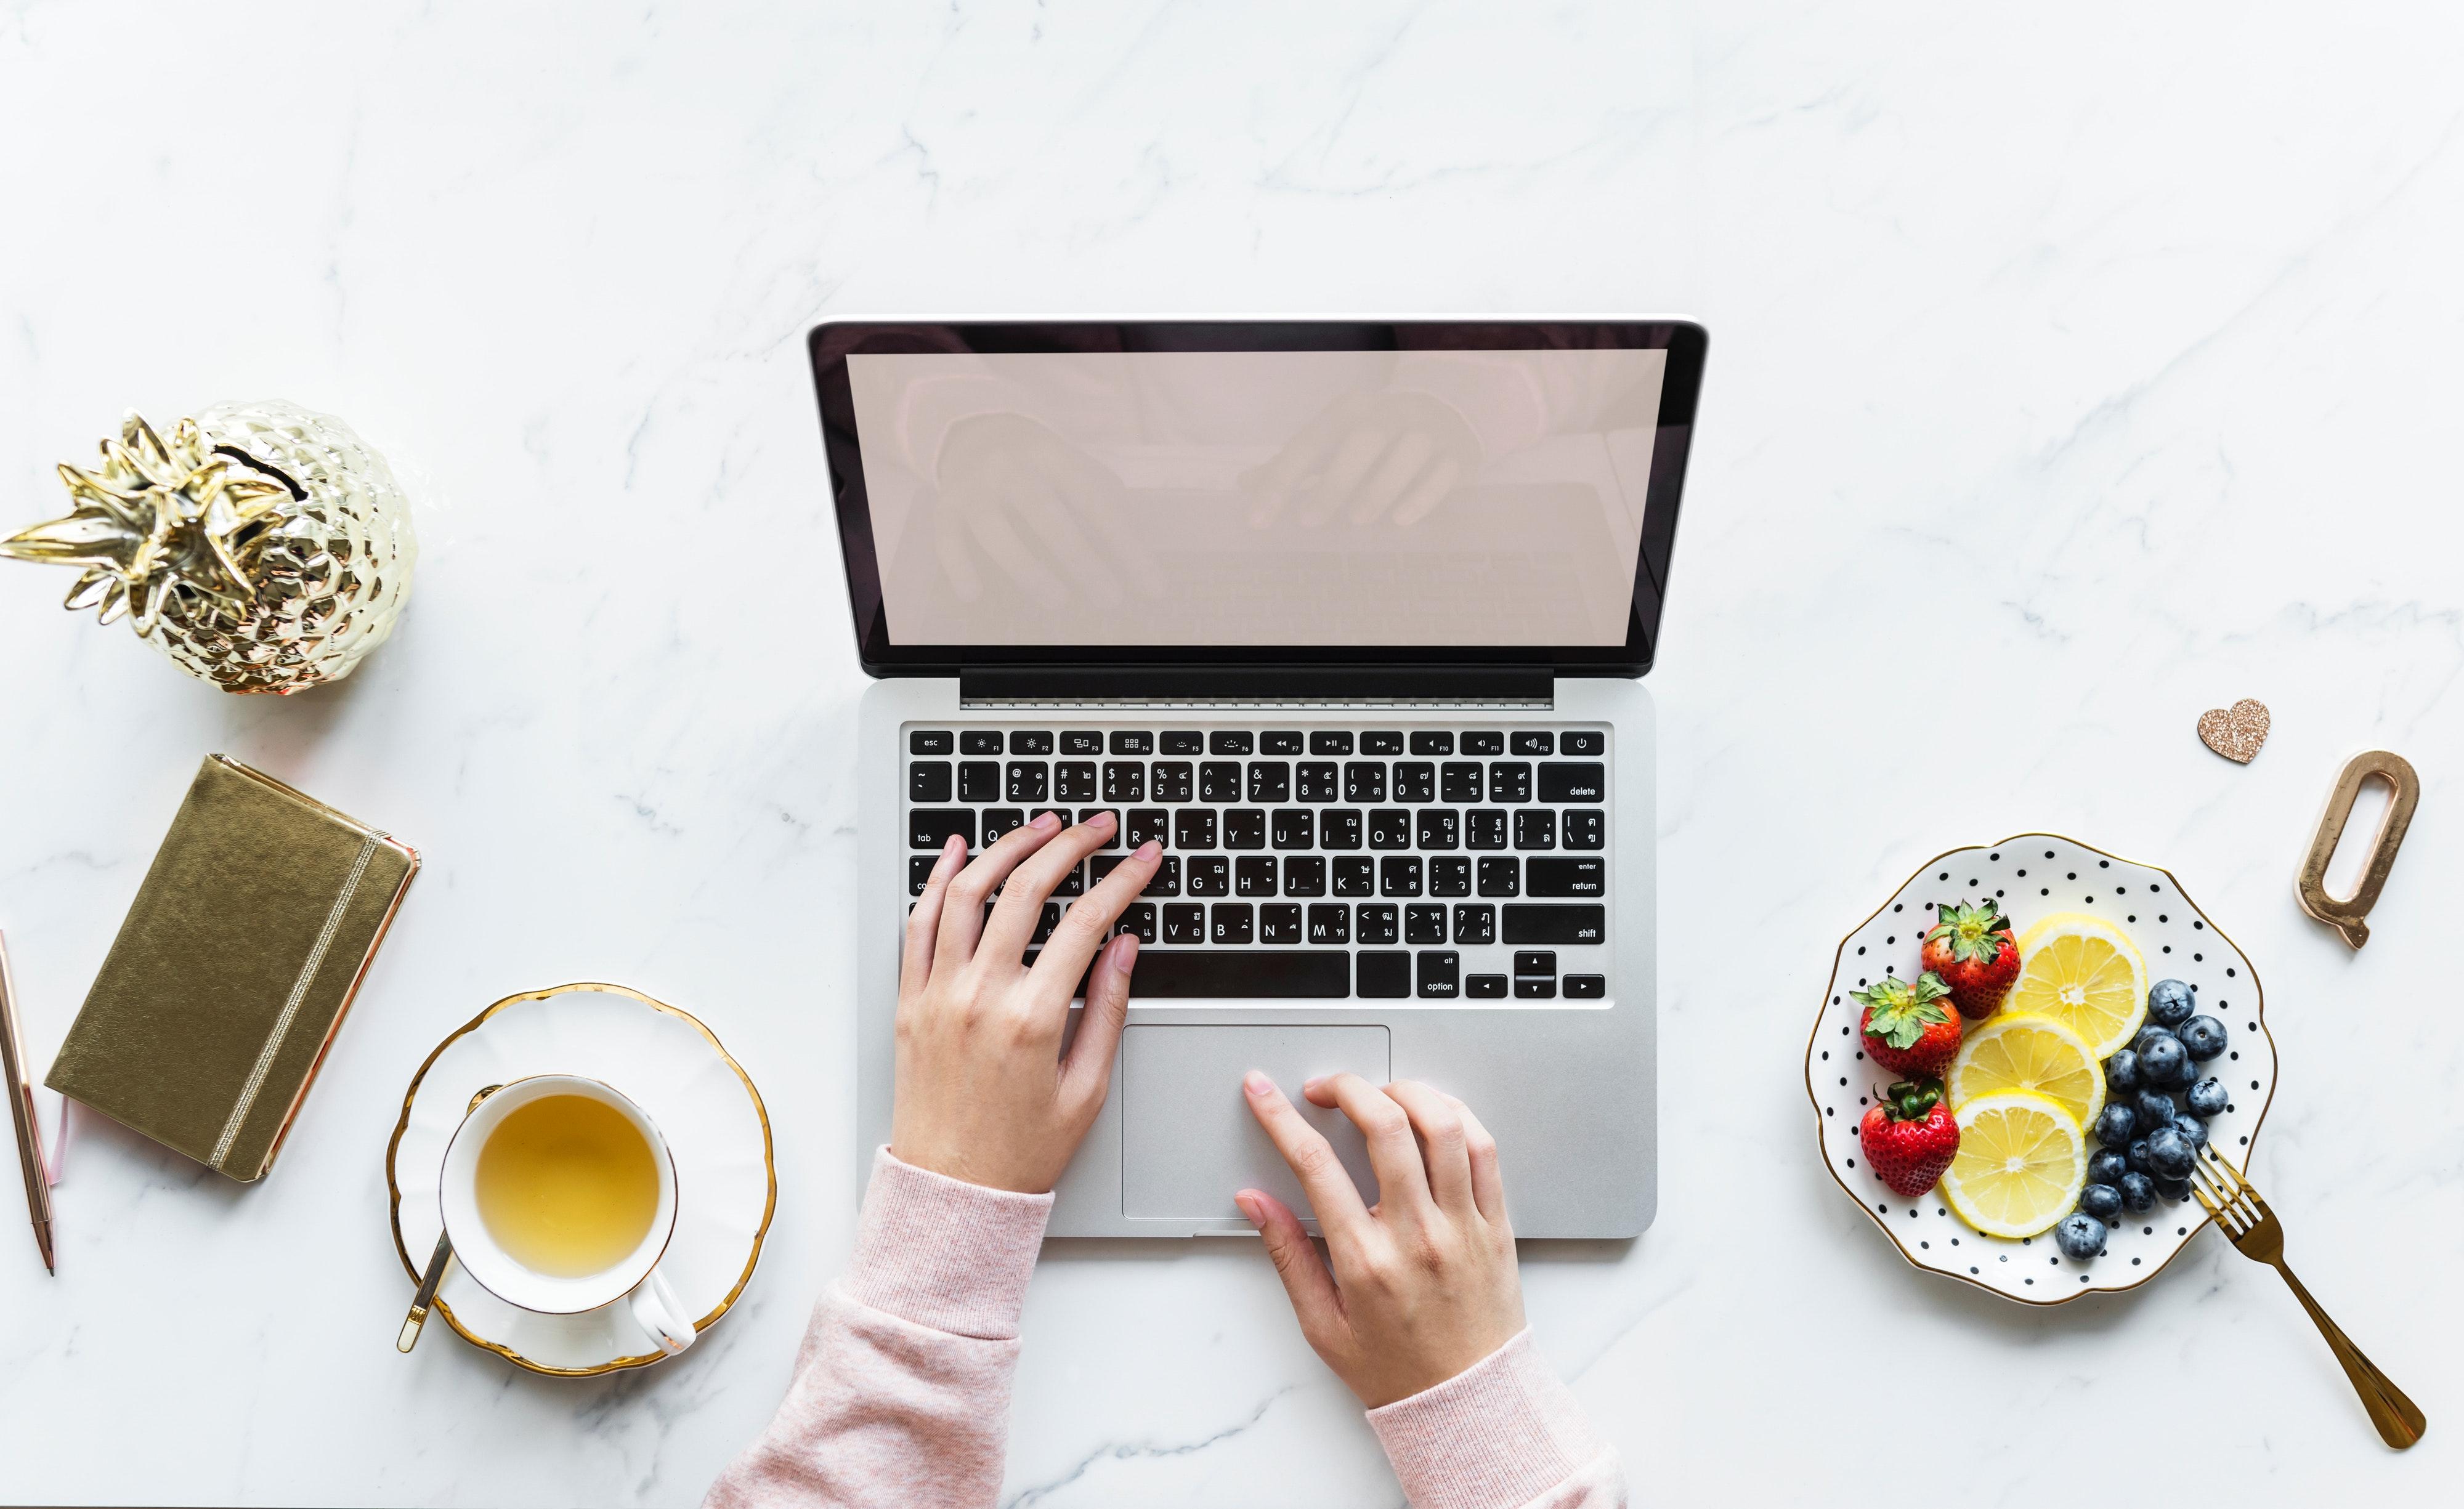 blogs-empowermens-zelfredzaamheid